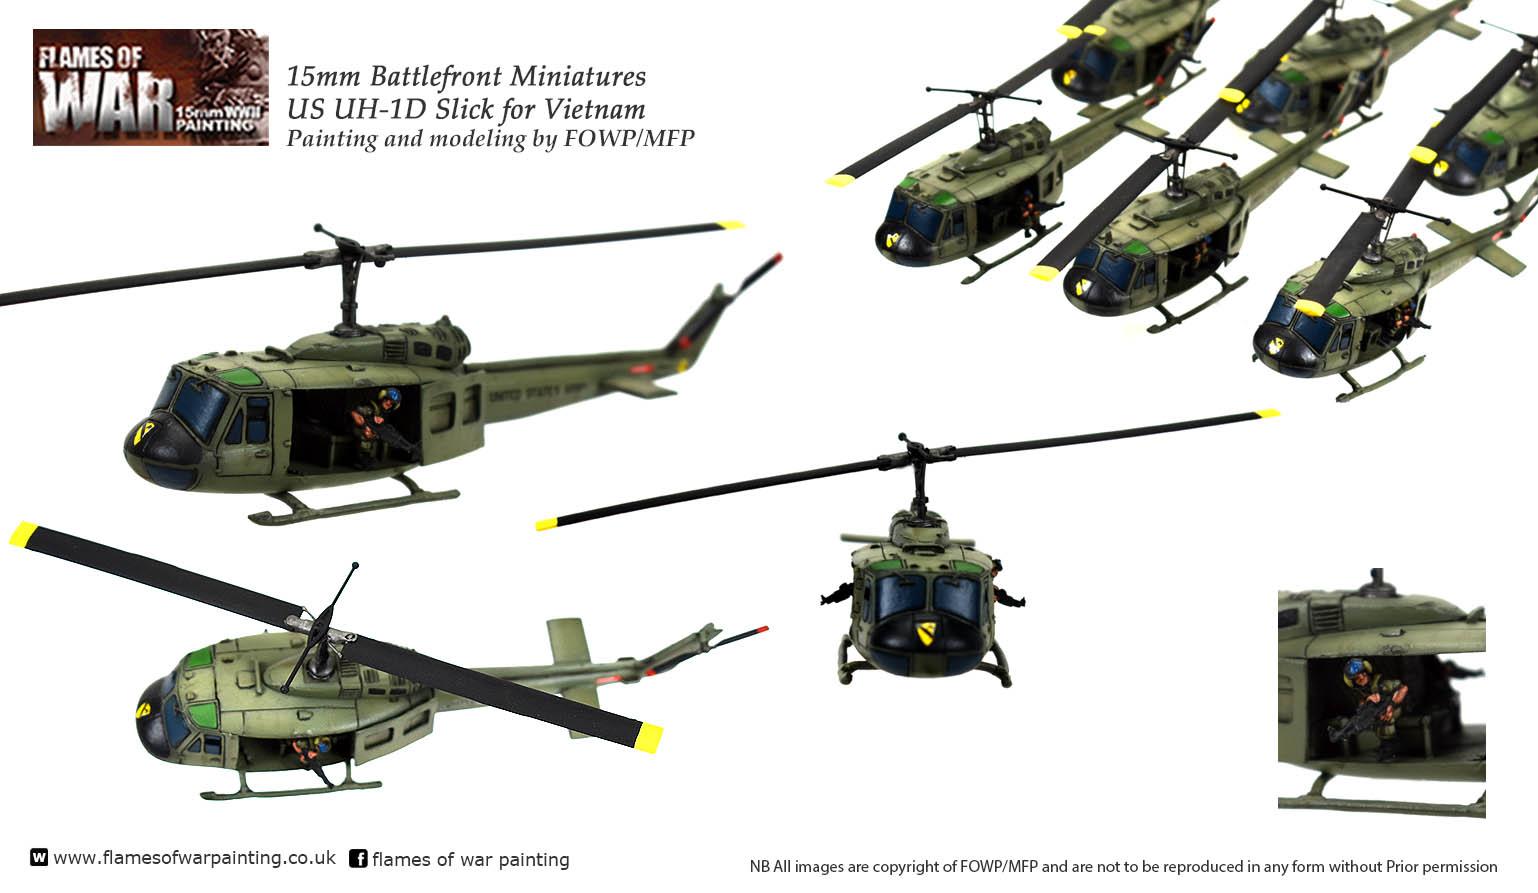 US UH-1D Slicks for Vietnam